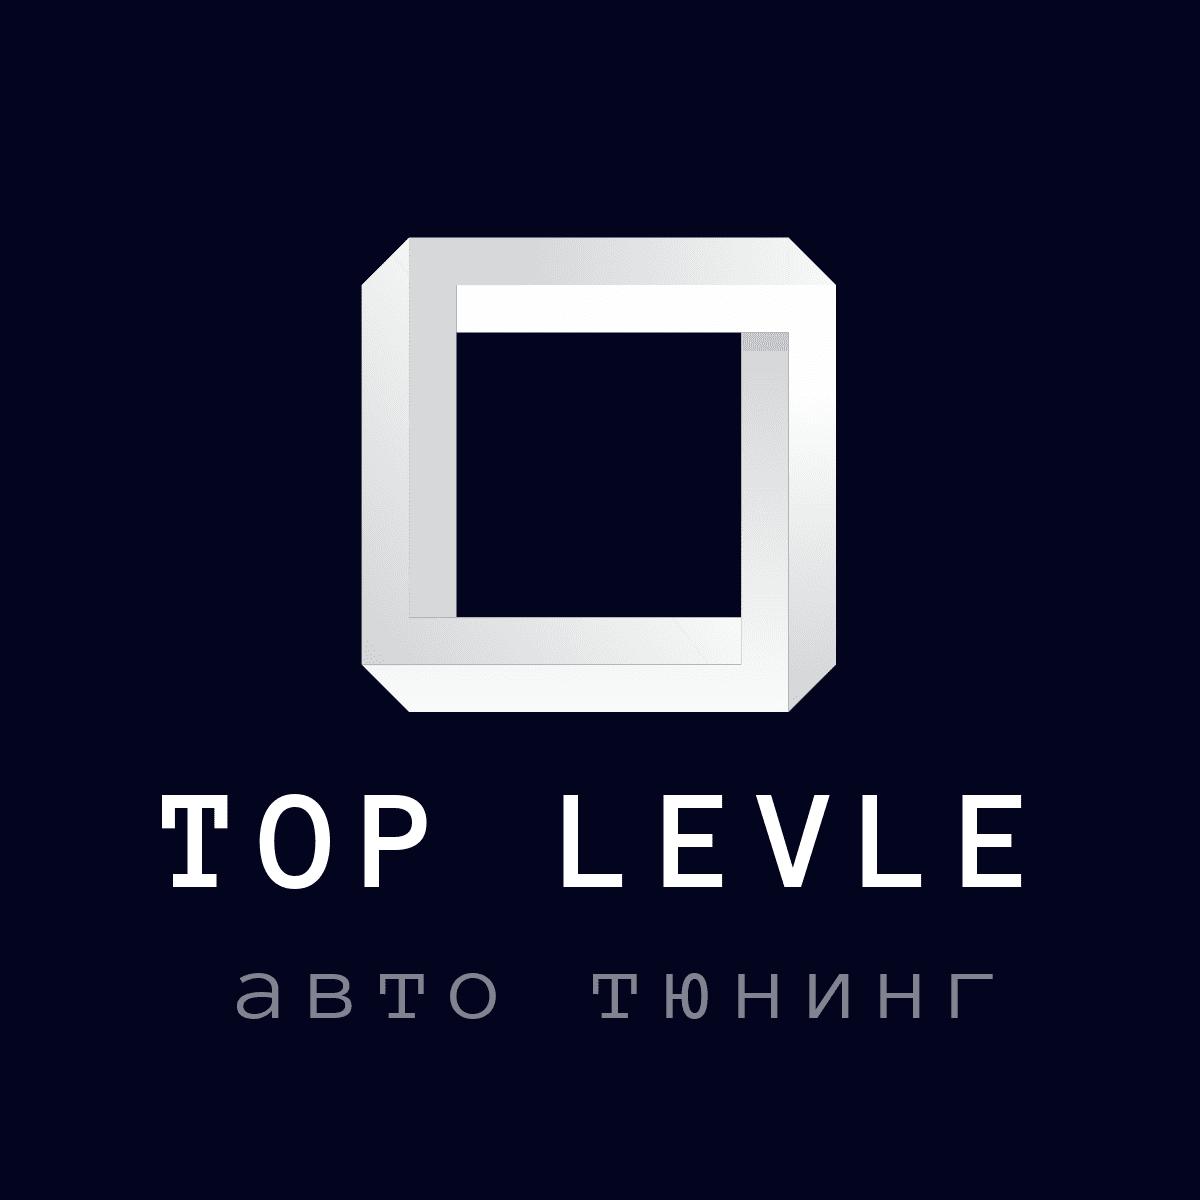 Разработка логотипа для тюнинг ателье фото f_9385f3fd311c5924.png